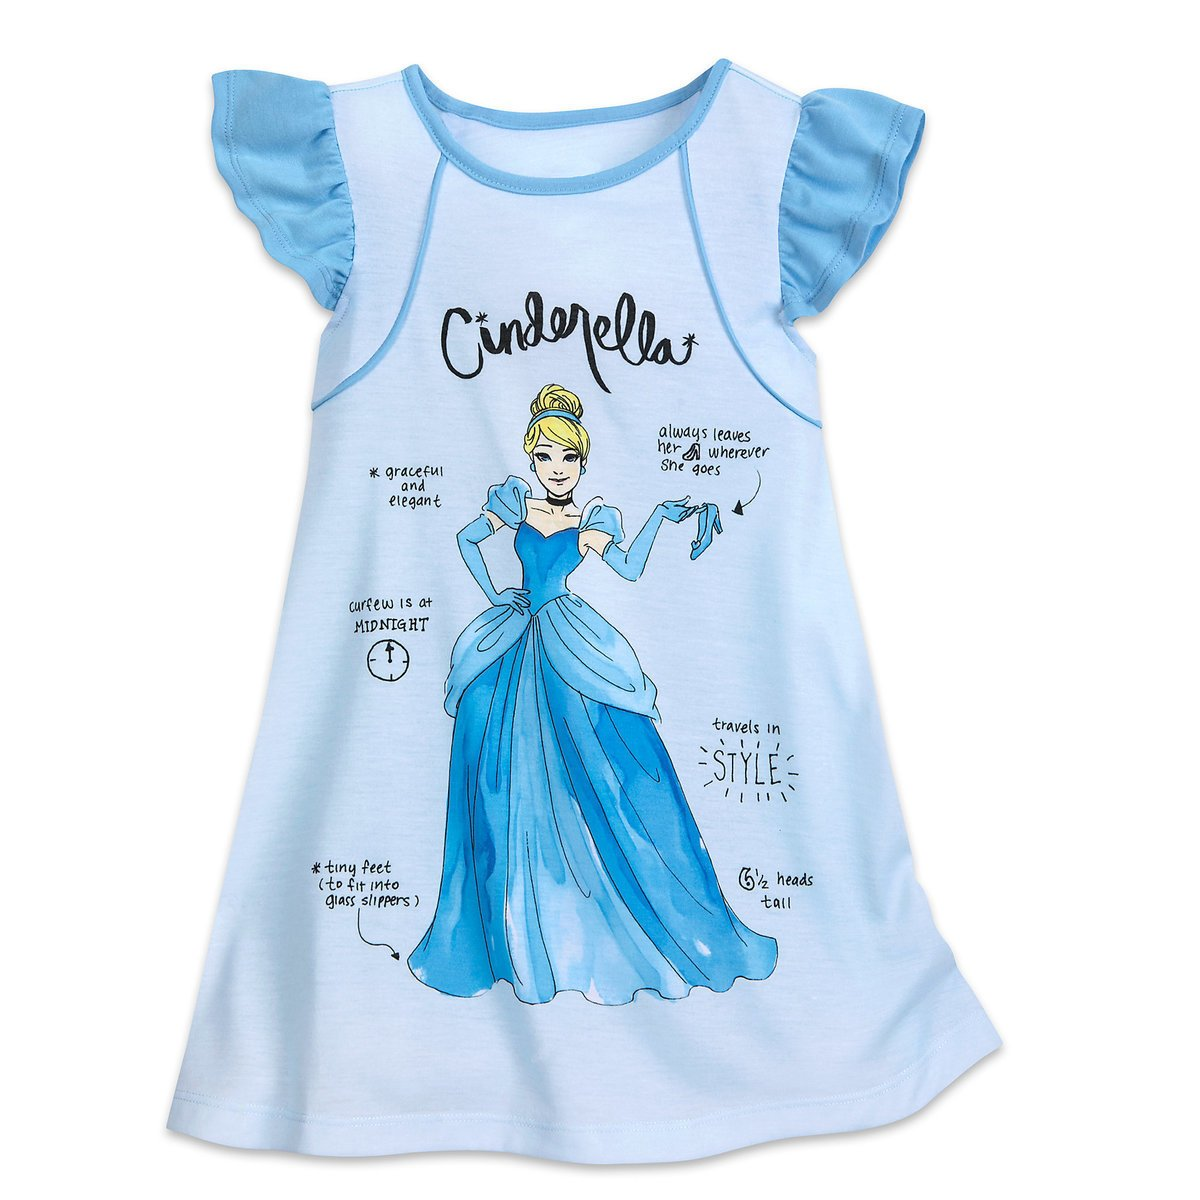 Disney Cinderella Nightshirt for Girls Size 4 Blue